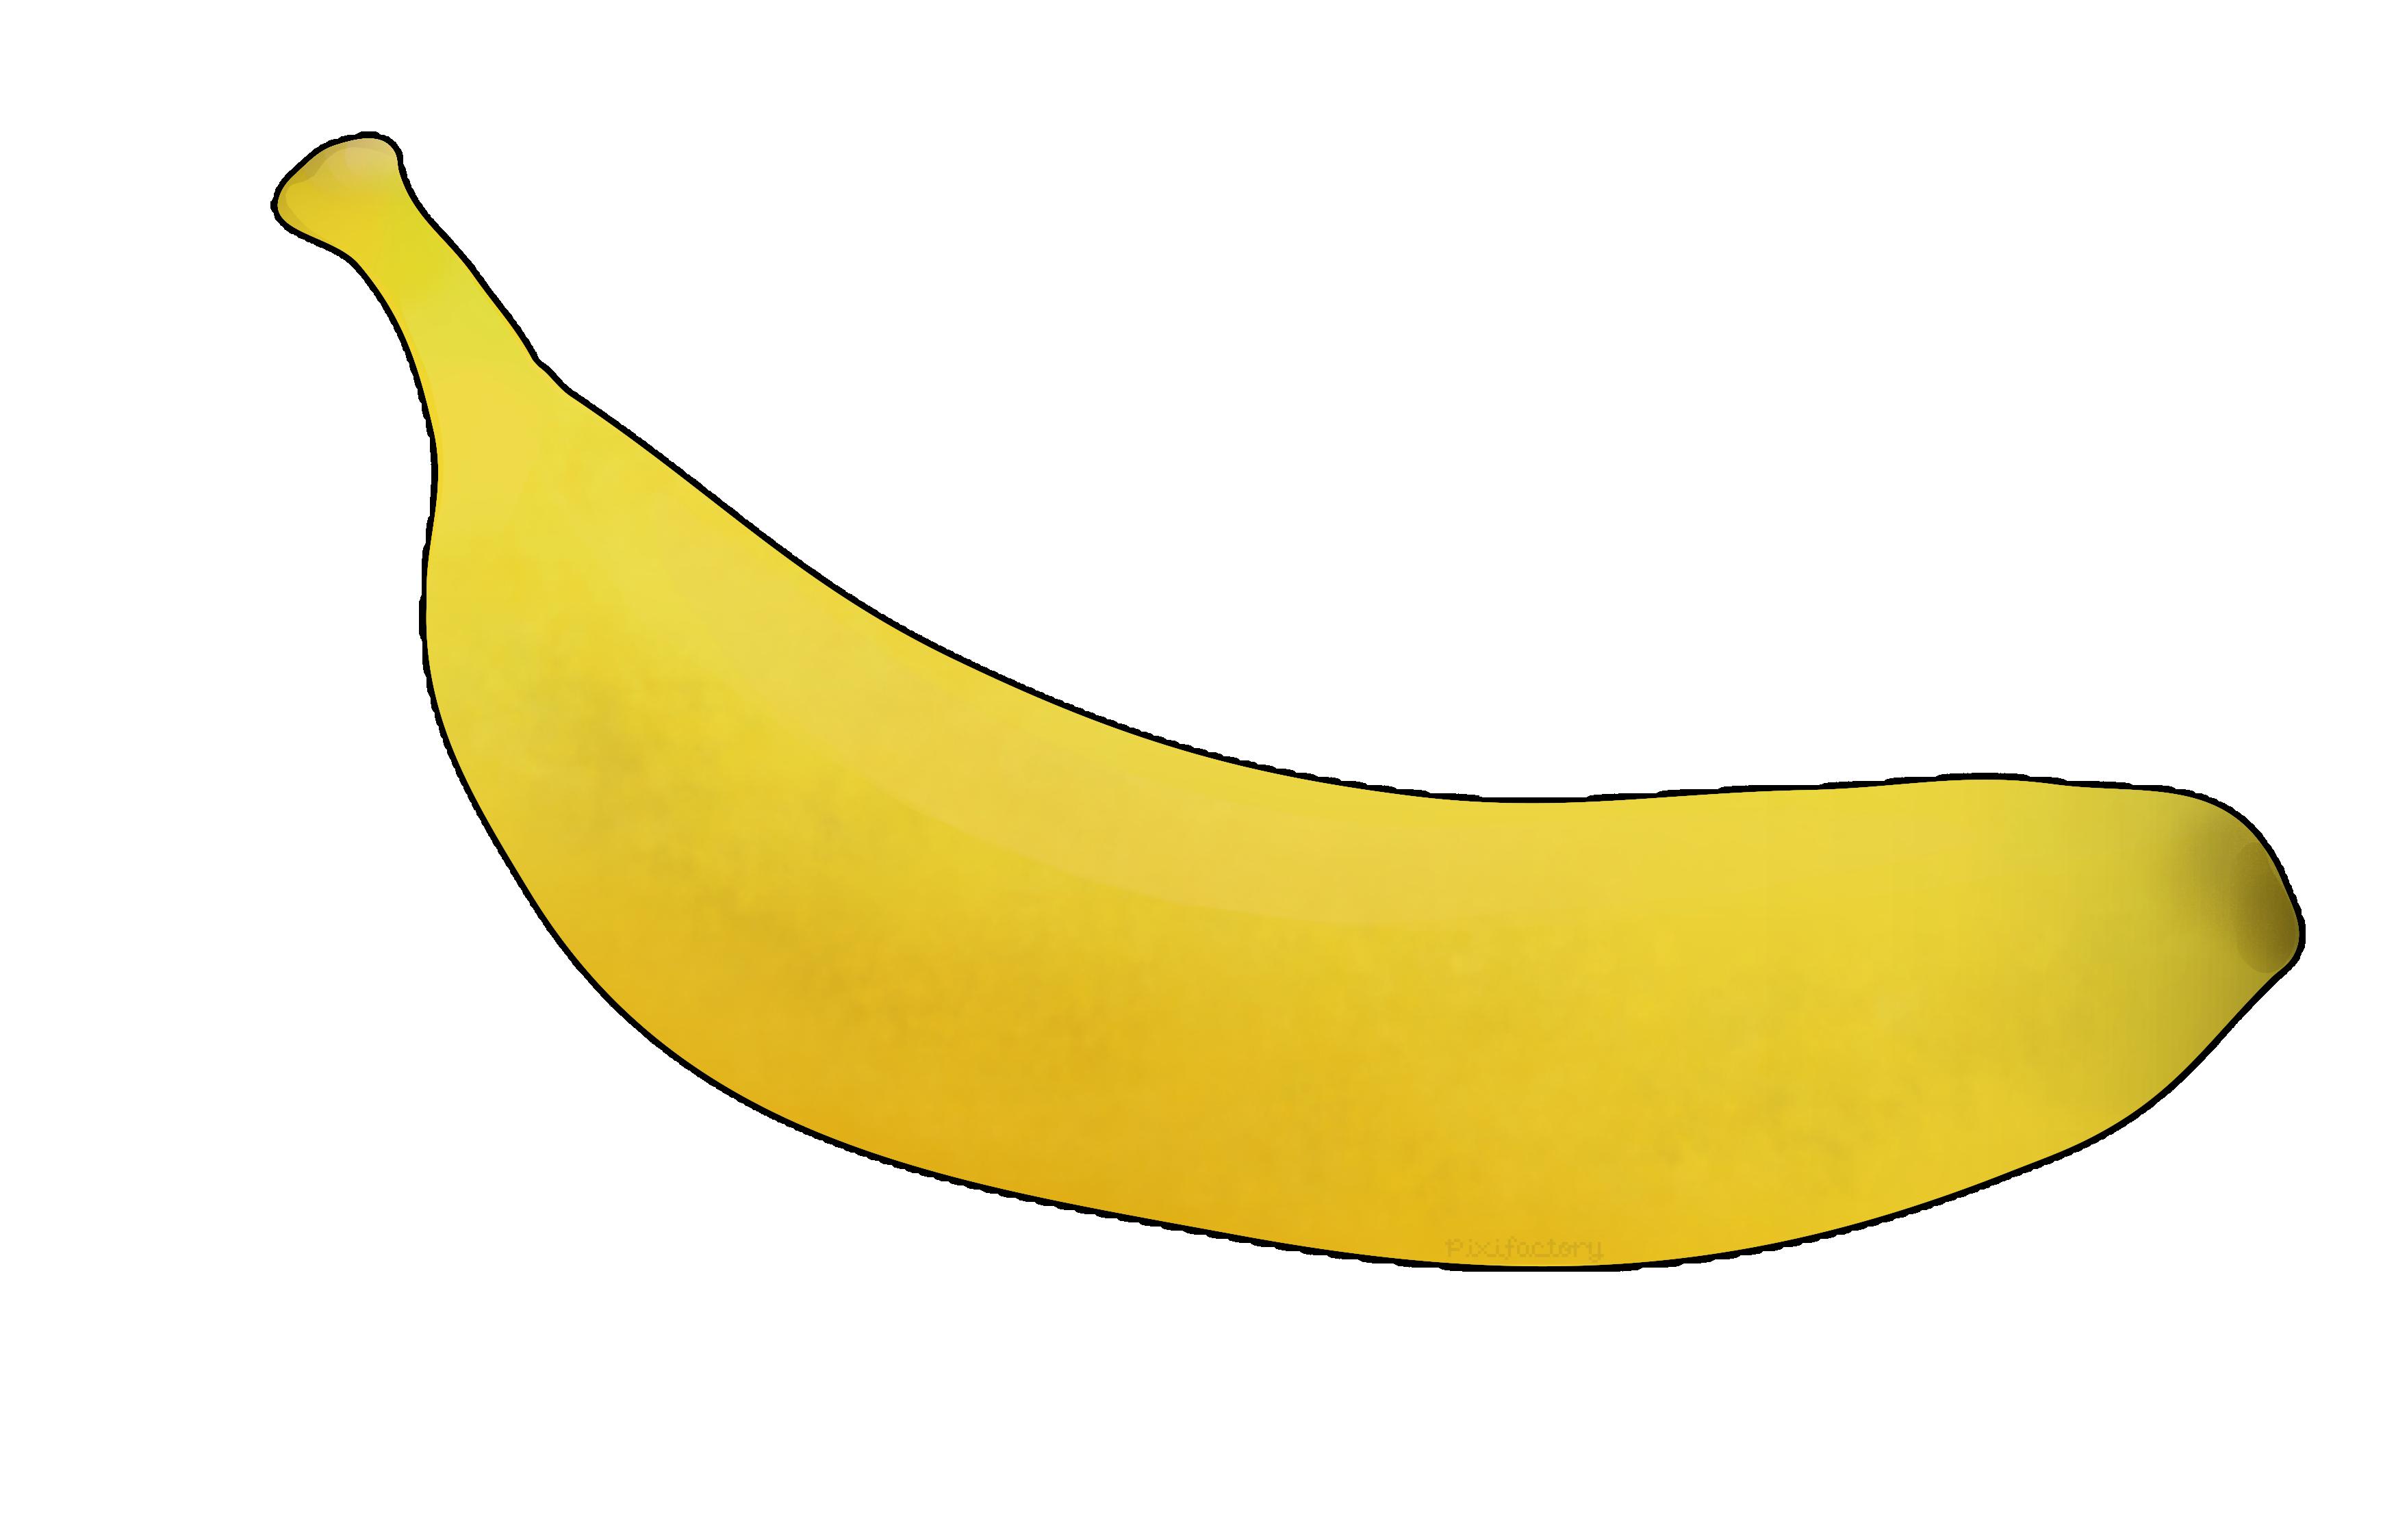 clip freeuse stock bananas clipart yellow banana #76289187